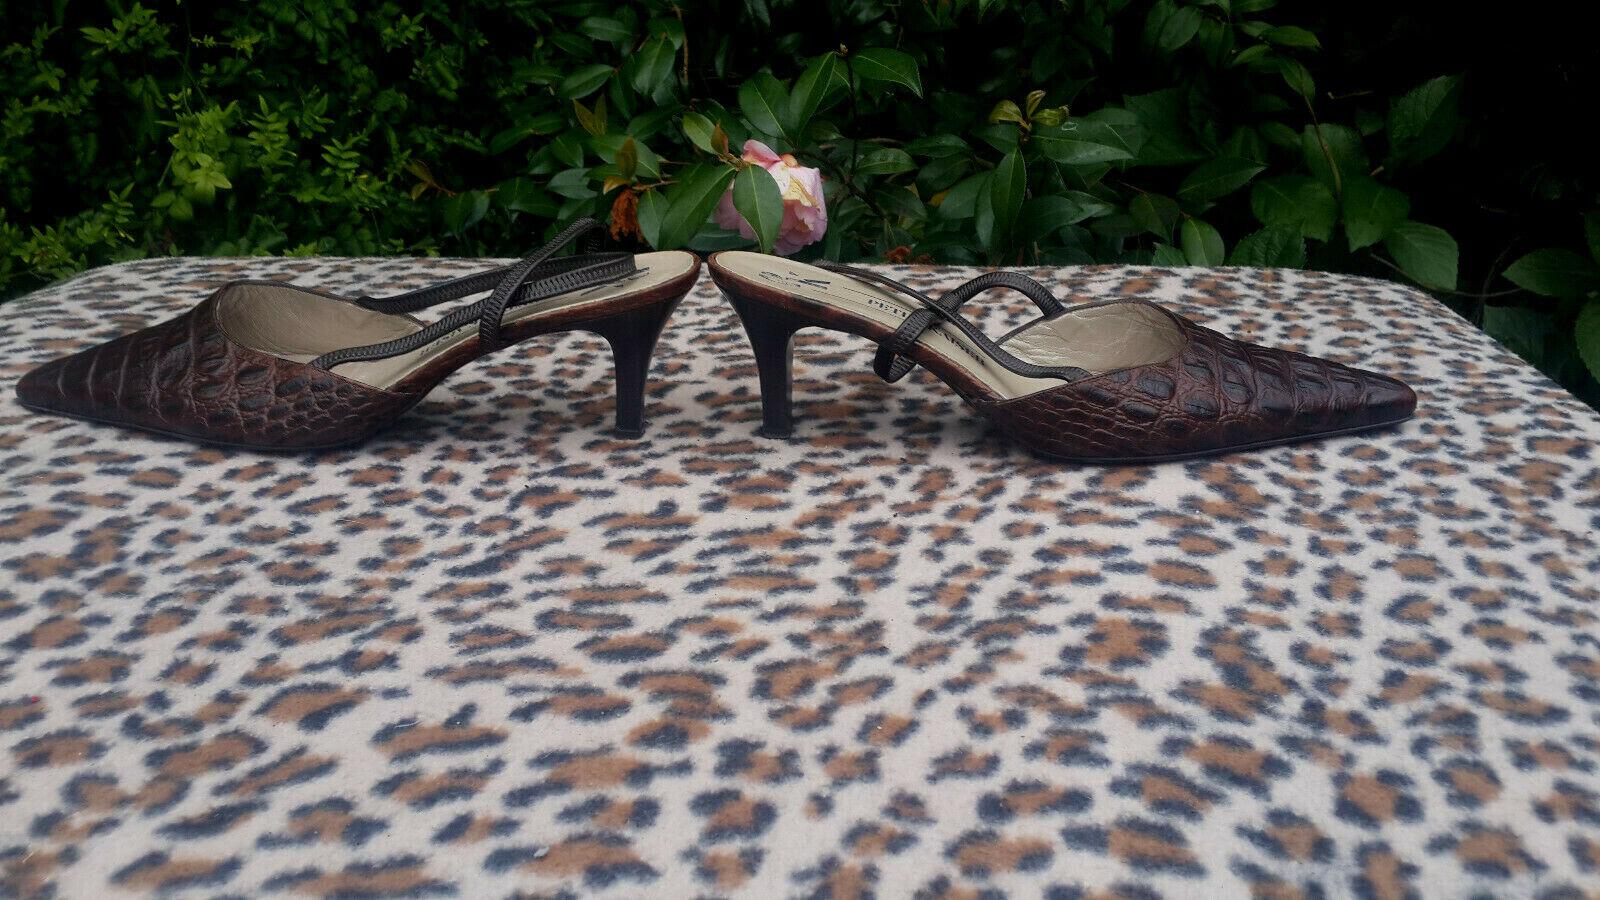 Peter Kaiser marron Crocodile Motif chaussures Cuir Taille UK 7.5 EU 41